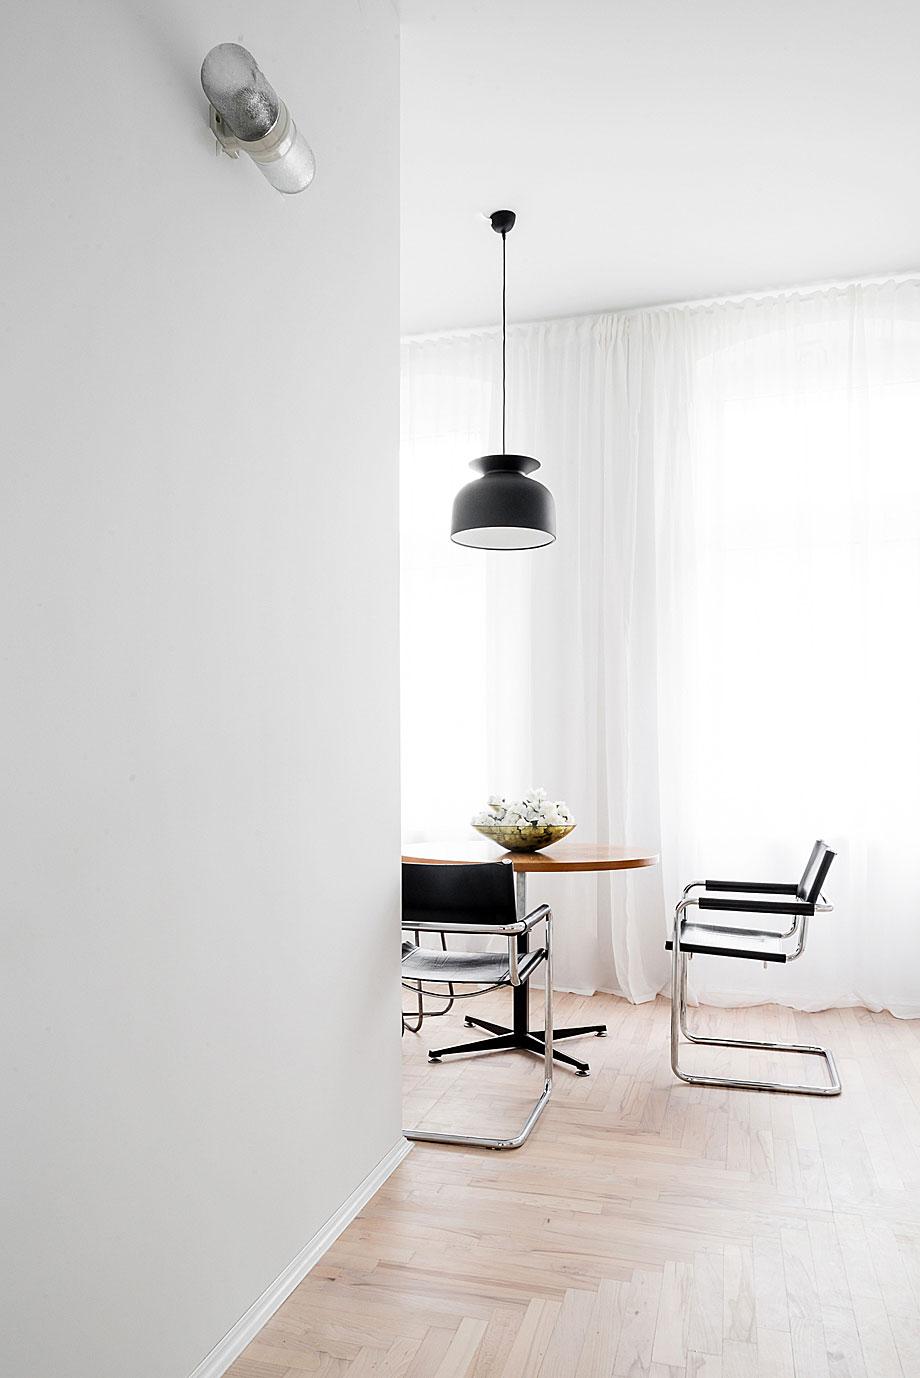 apartamento-tenement-loft-kolasinski (19)